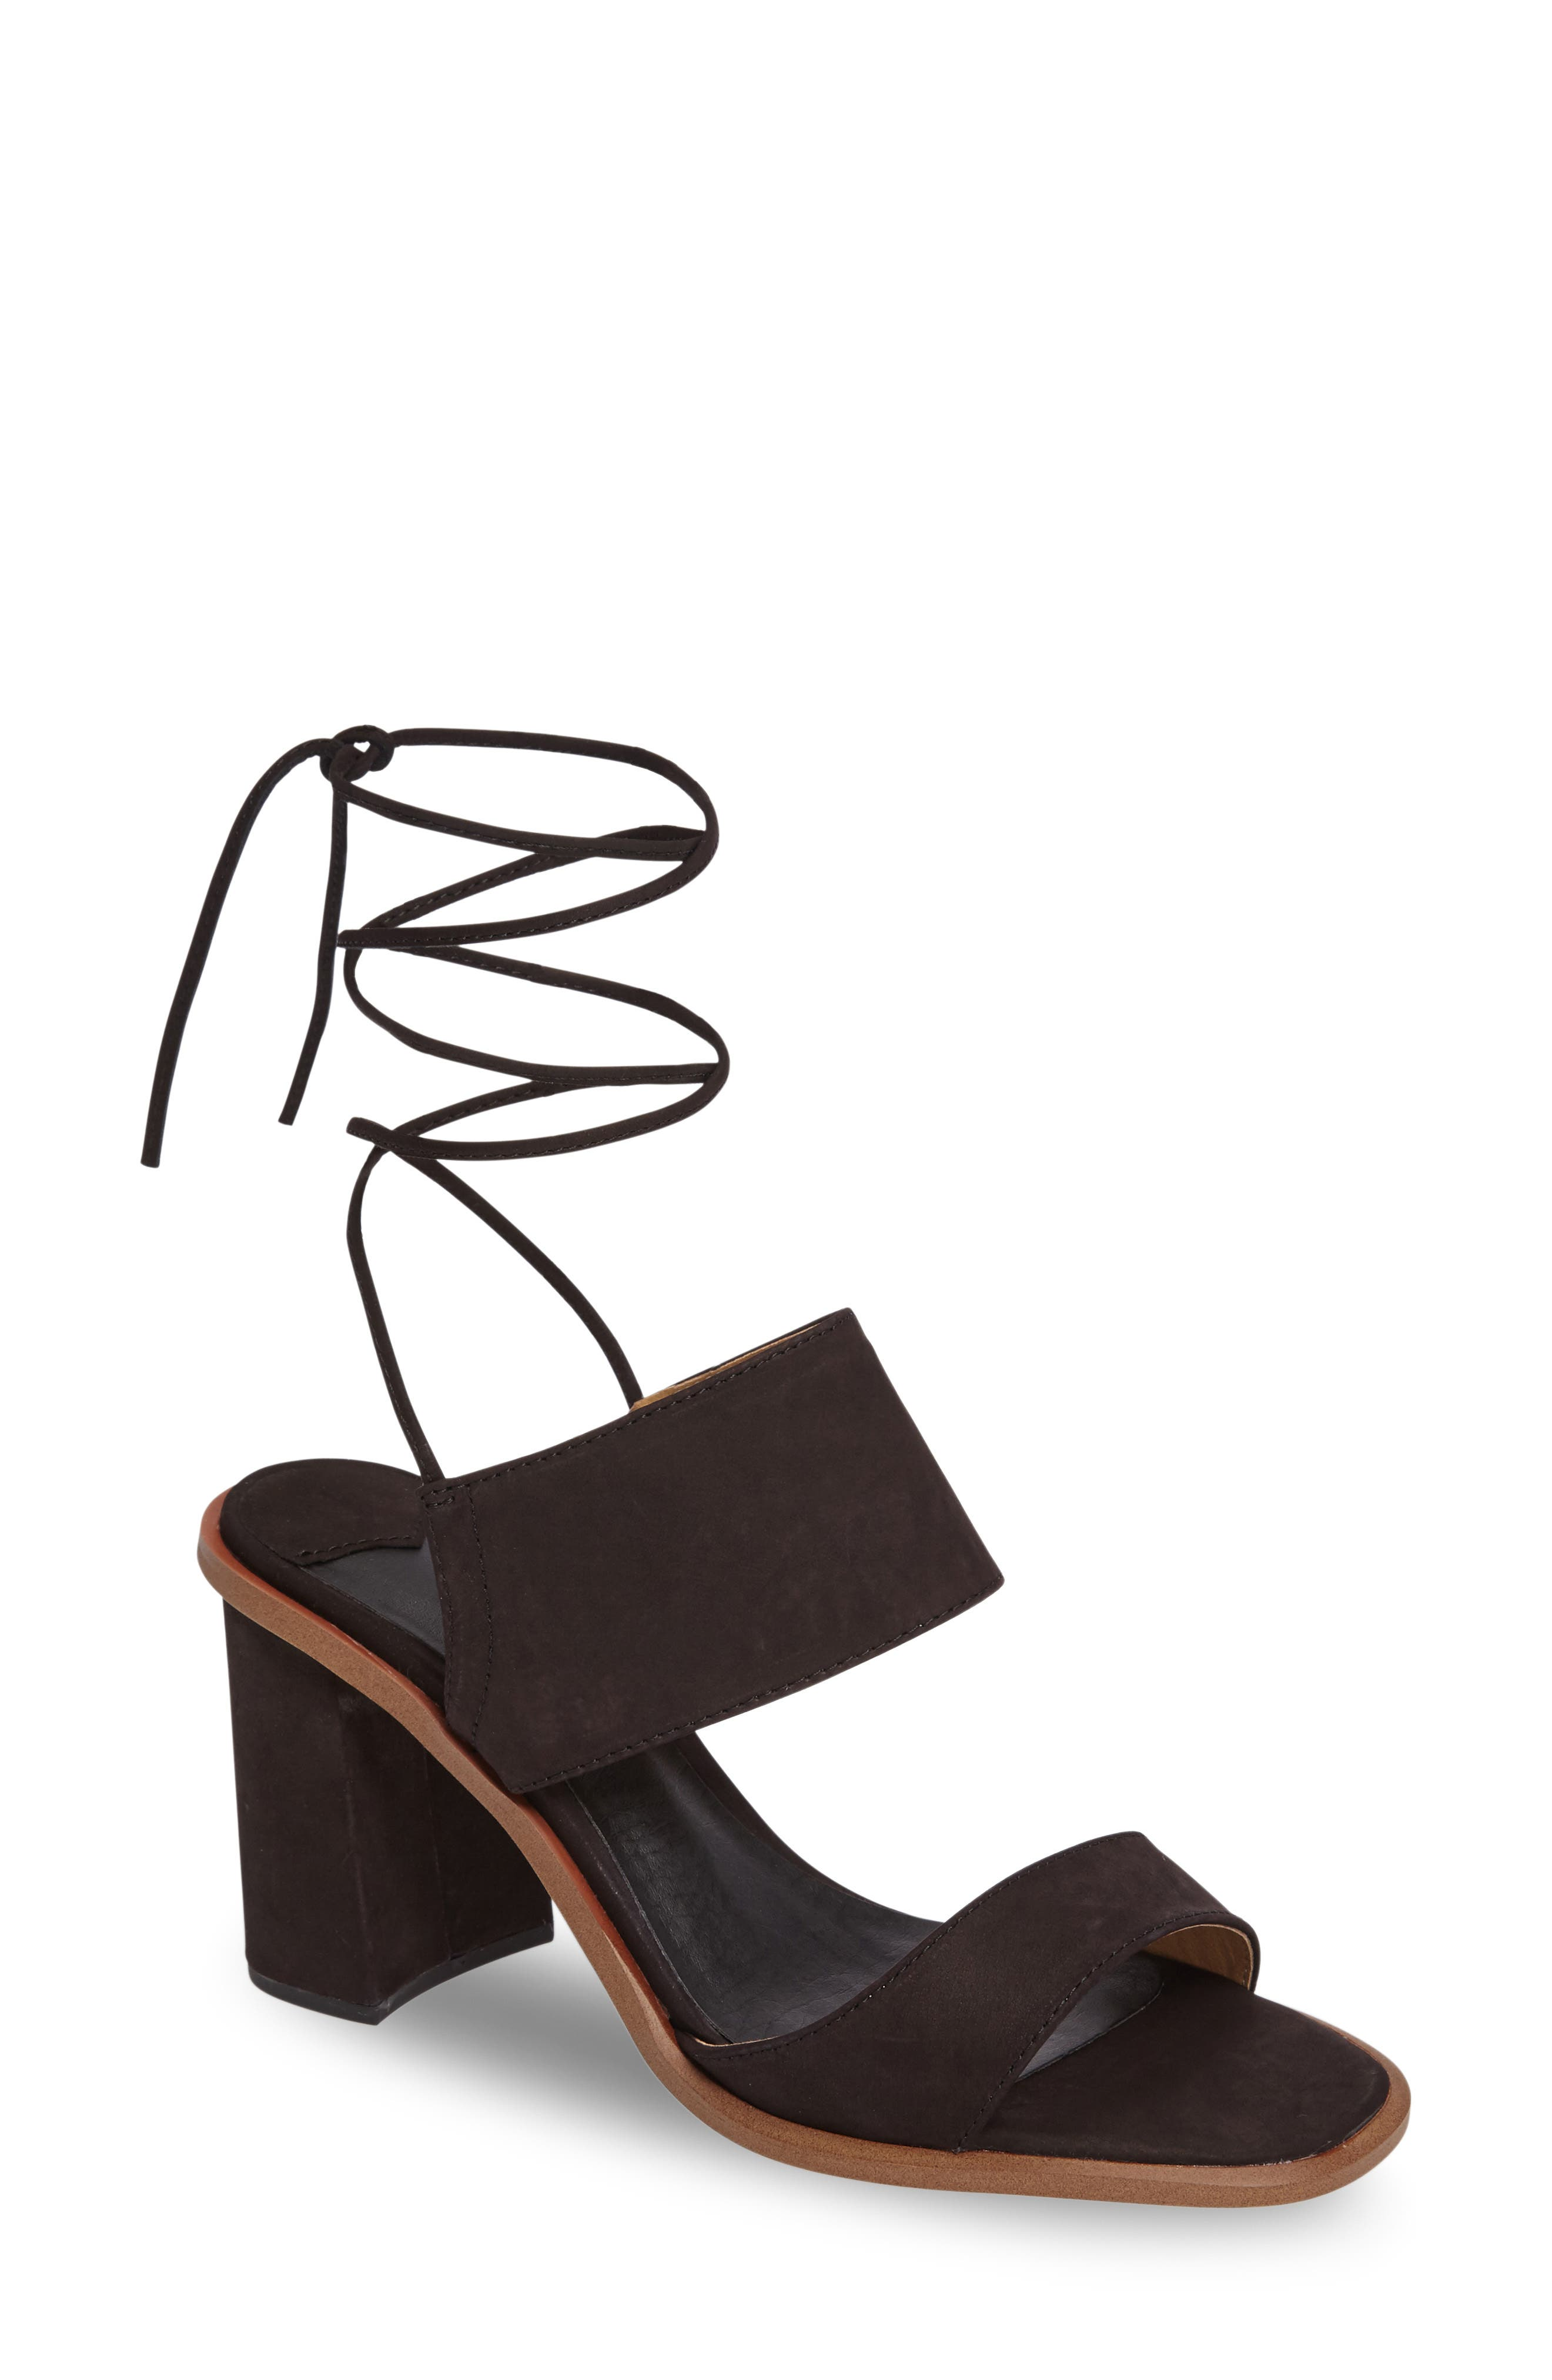 Cuoco Ankle Strap Sandal,                             Main thumbnail 1, color,                             001